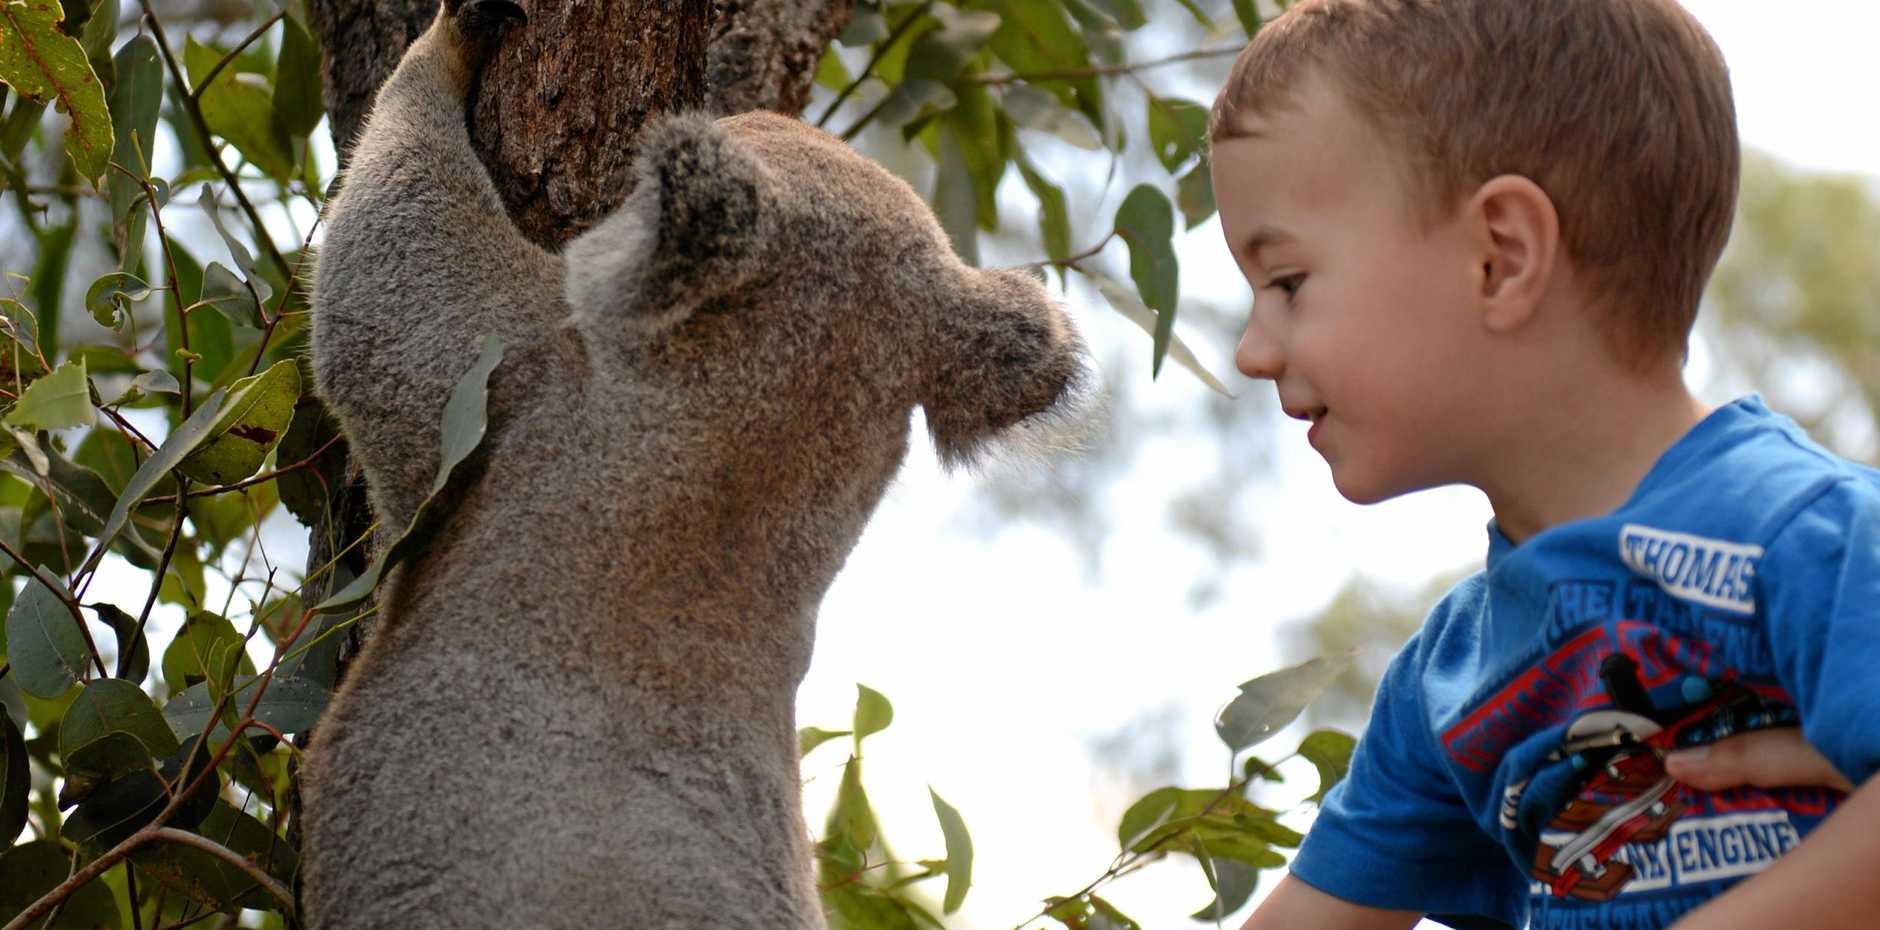 LOVE THE ZOO: Three year old Leyton Steinhardt meeting Rockhampton Zoo's Lleyton the koala.